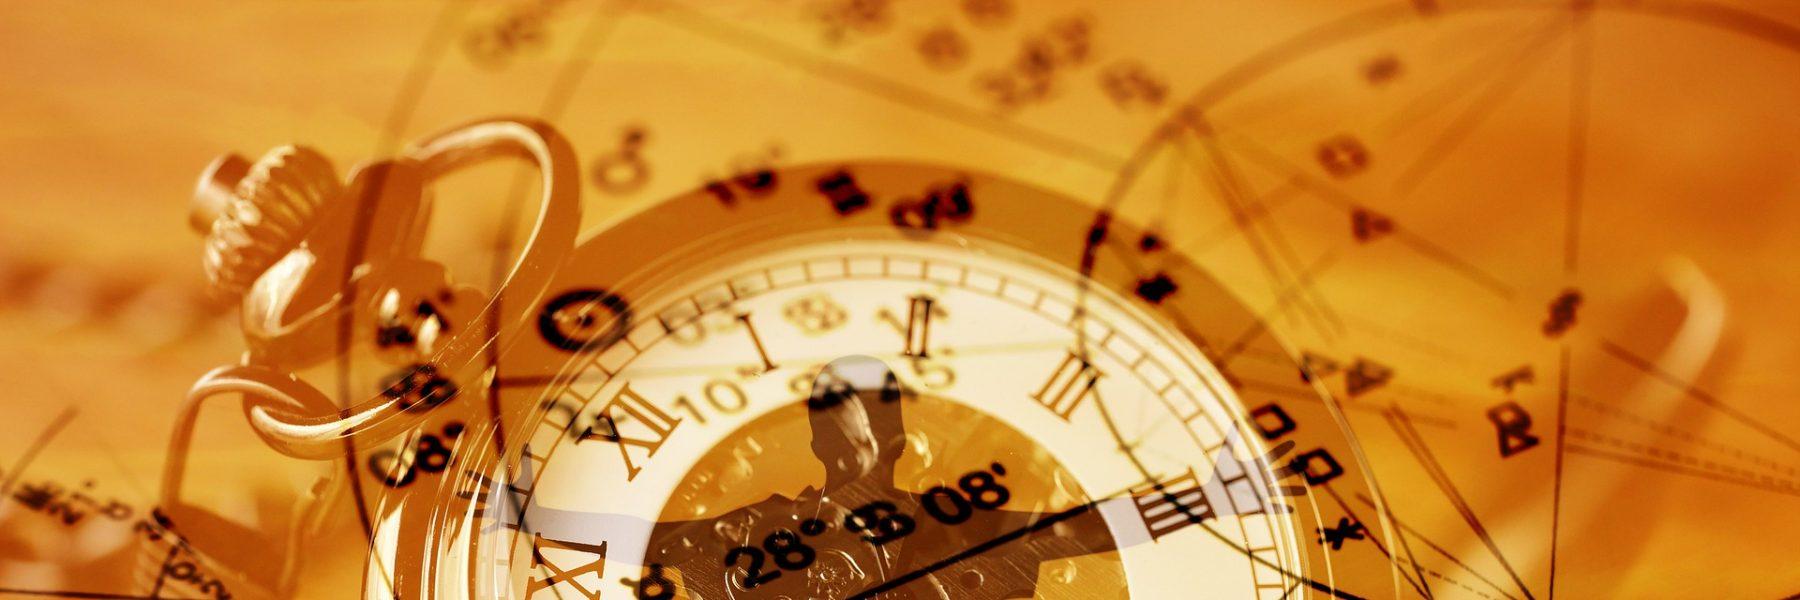 horloge astrologie Capricorne